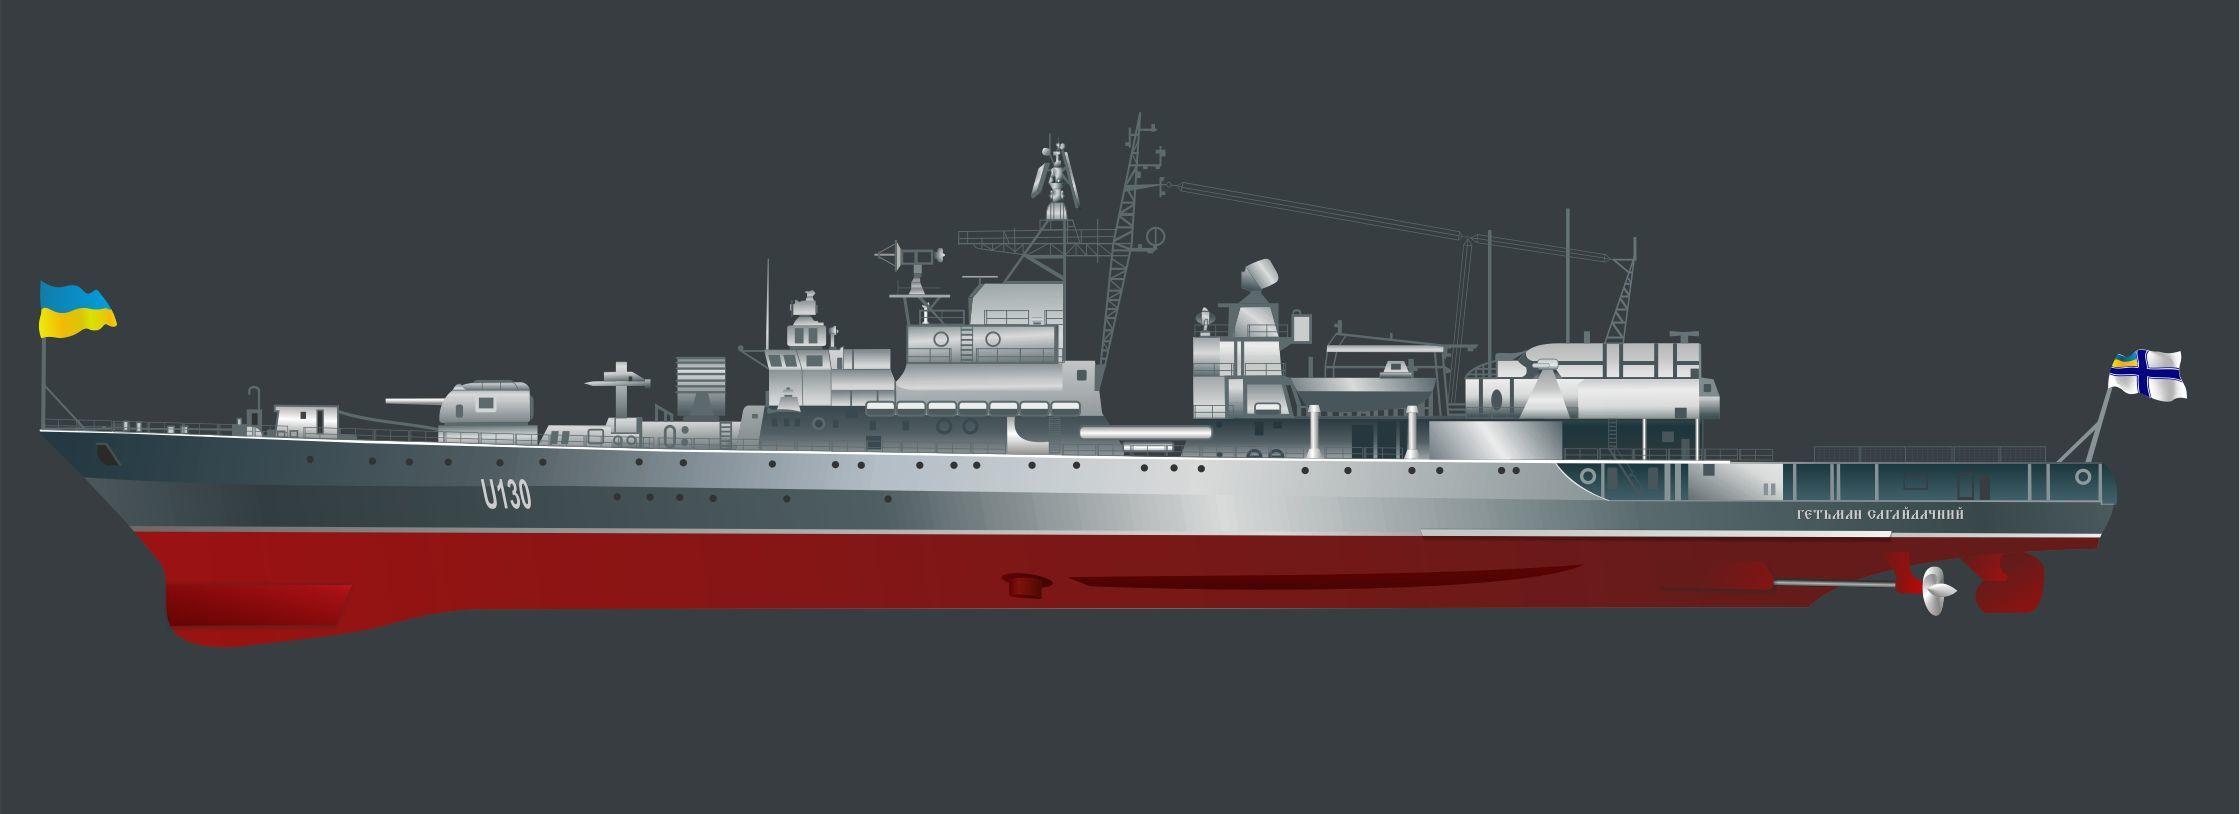 Ukrainian_frigate_Hetman_Sahaydachniy_(U130)